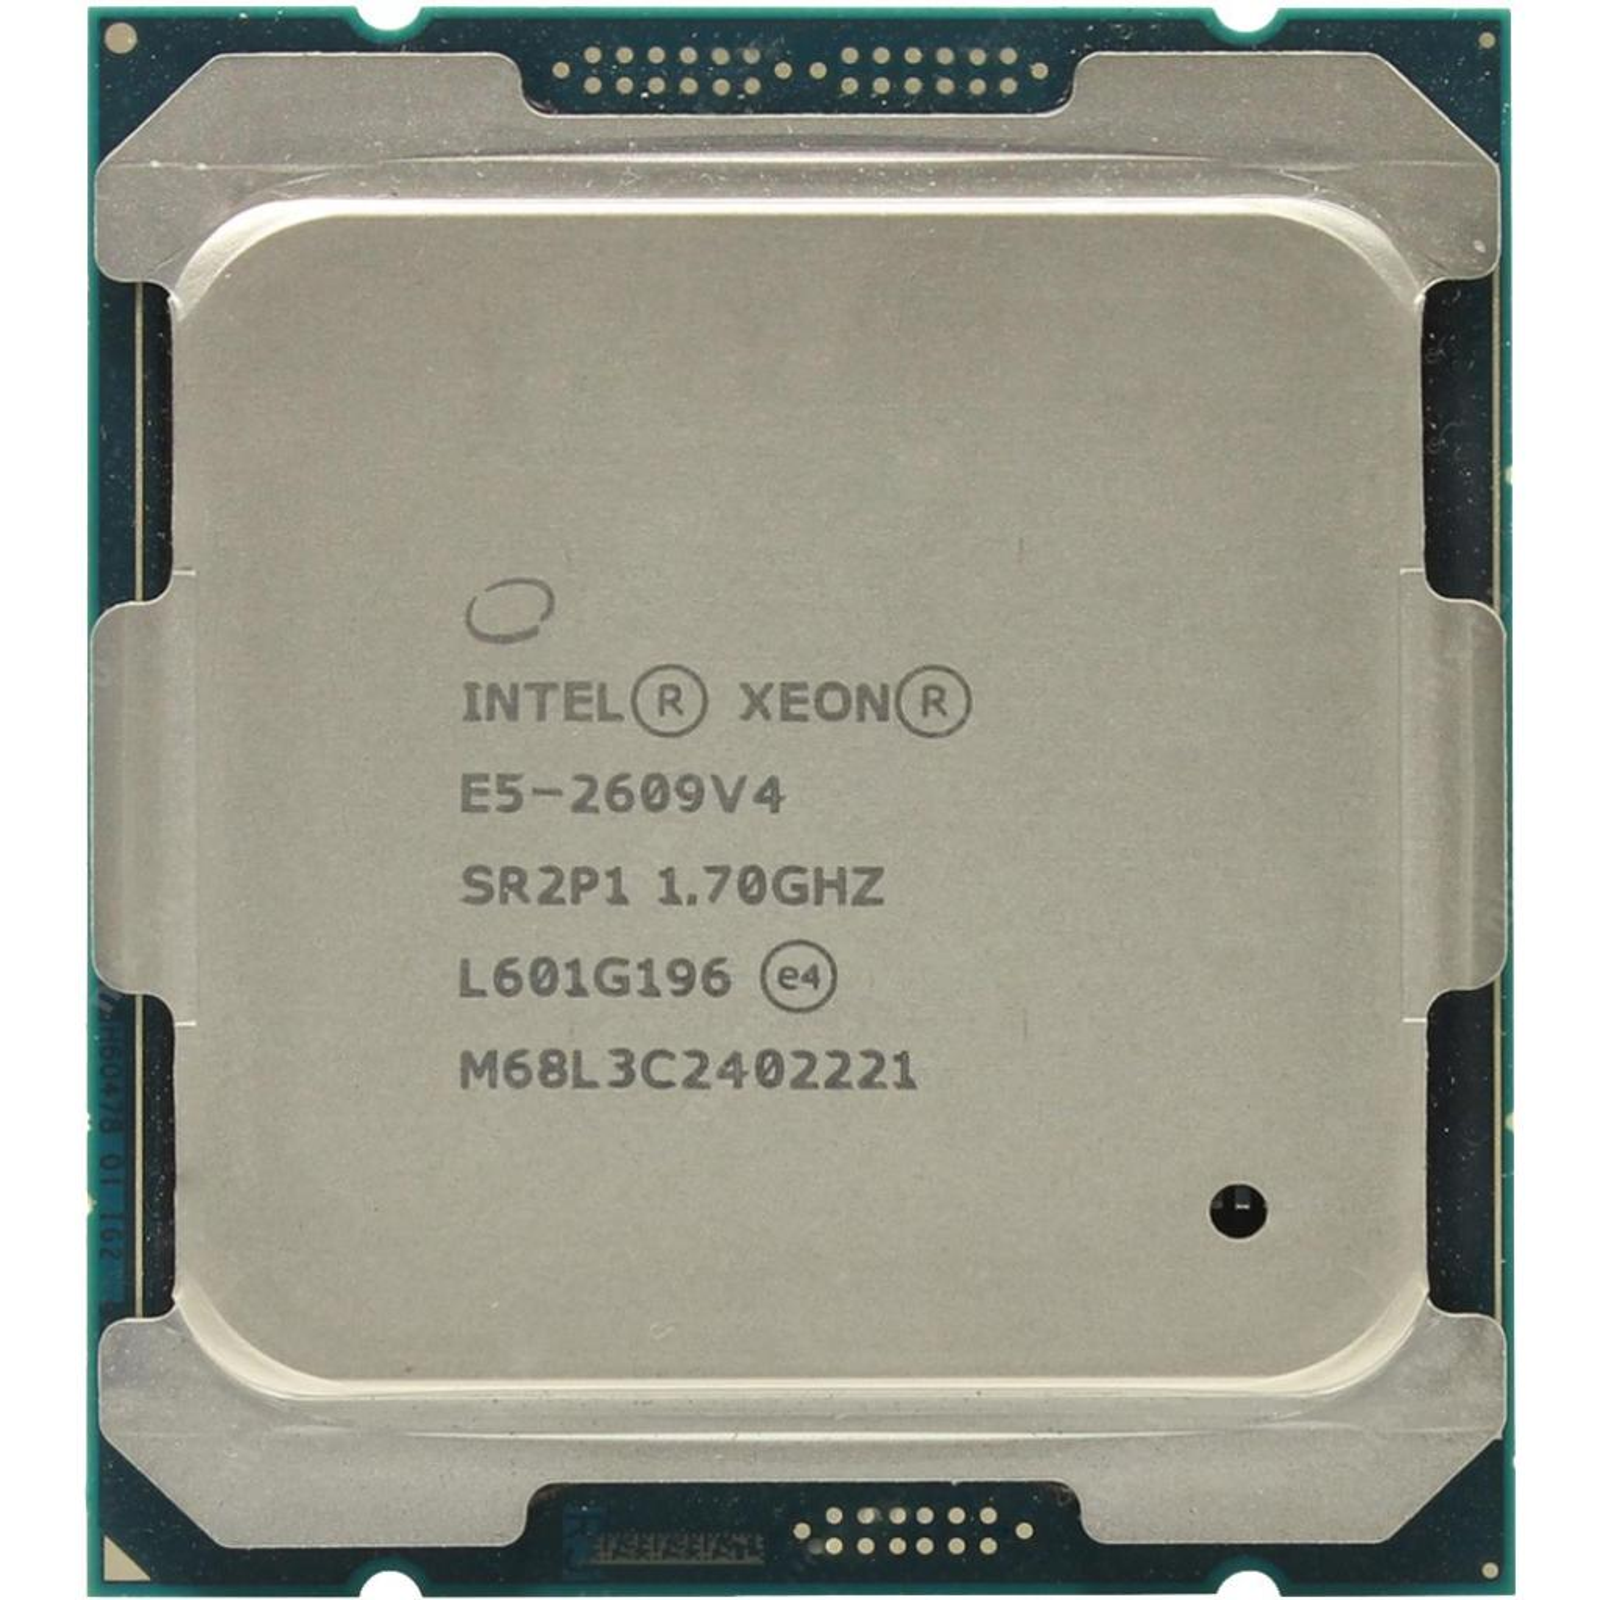 Процессор серверный INTEL Xeon E5-2609V4 8C/8T/1.70GHz/NoGfx/6.40GT/20MB/FCLGA2011-3 T (CM8066002032901)